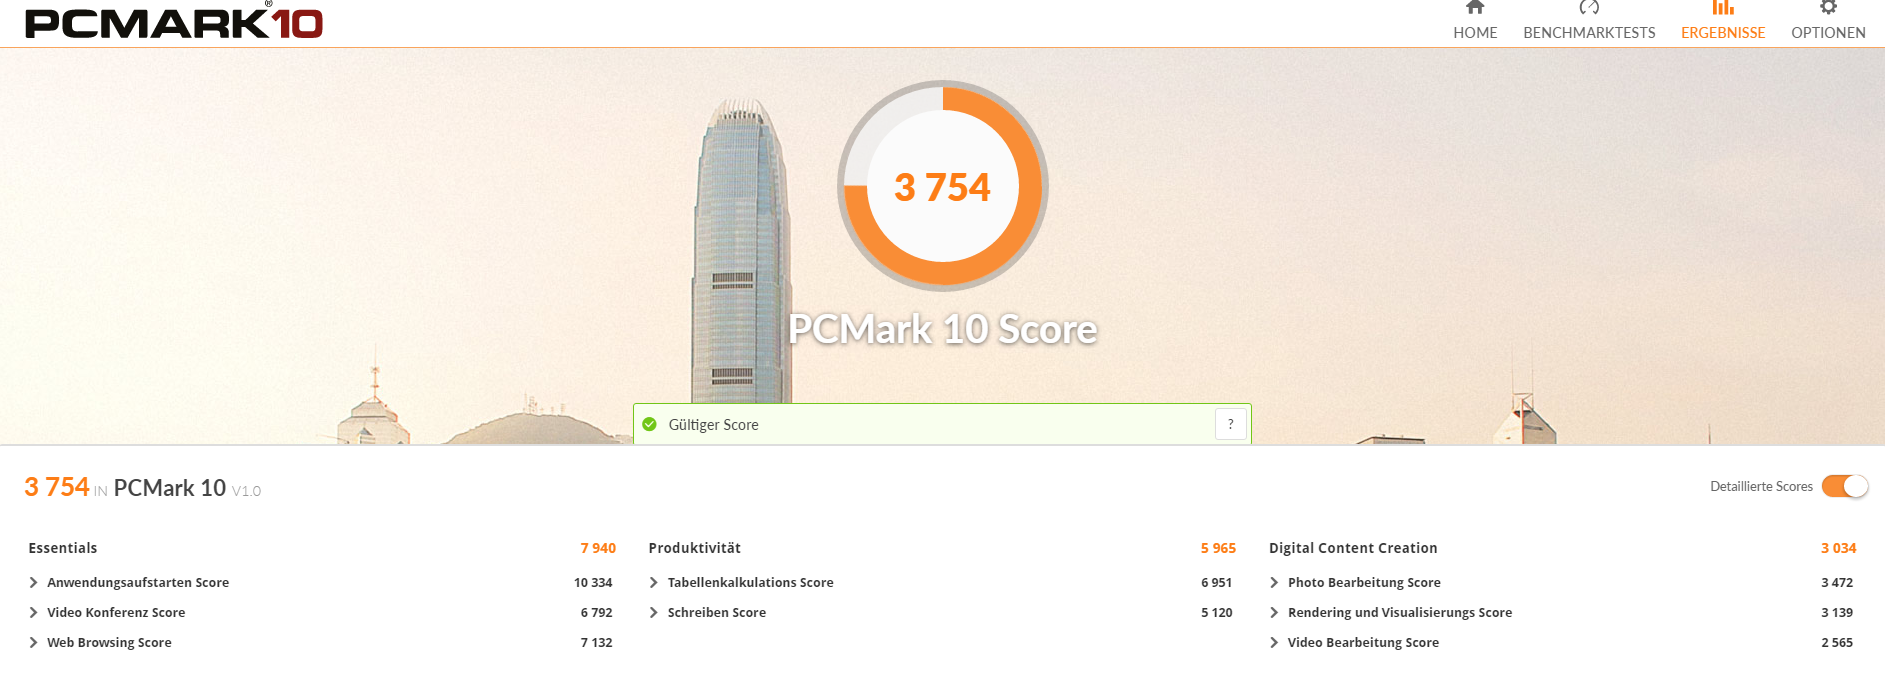 Xiaomi Mi Notebook Pro PCMark